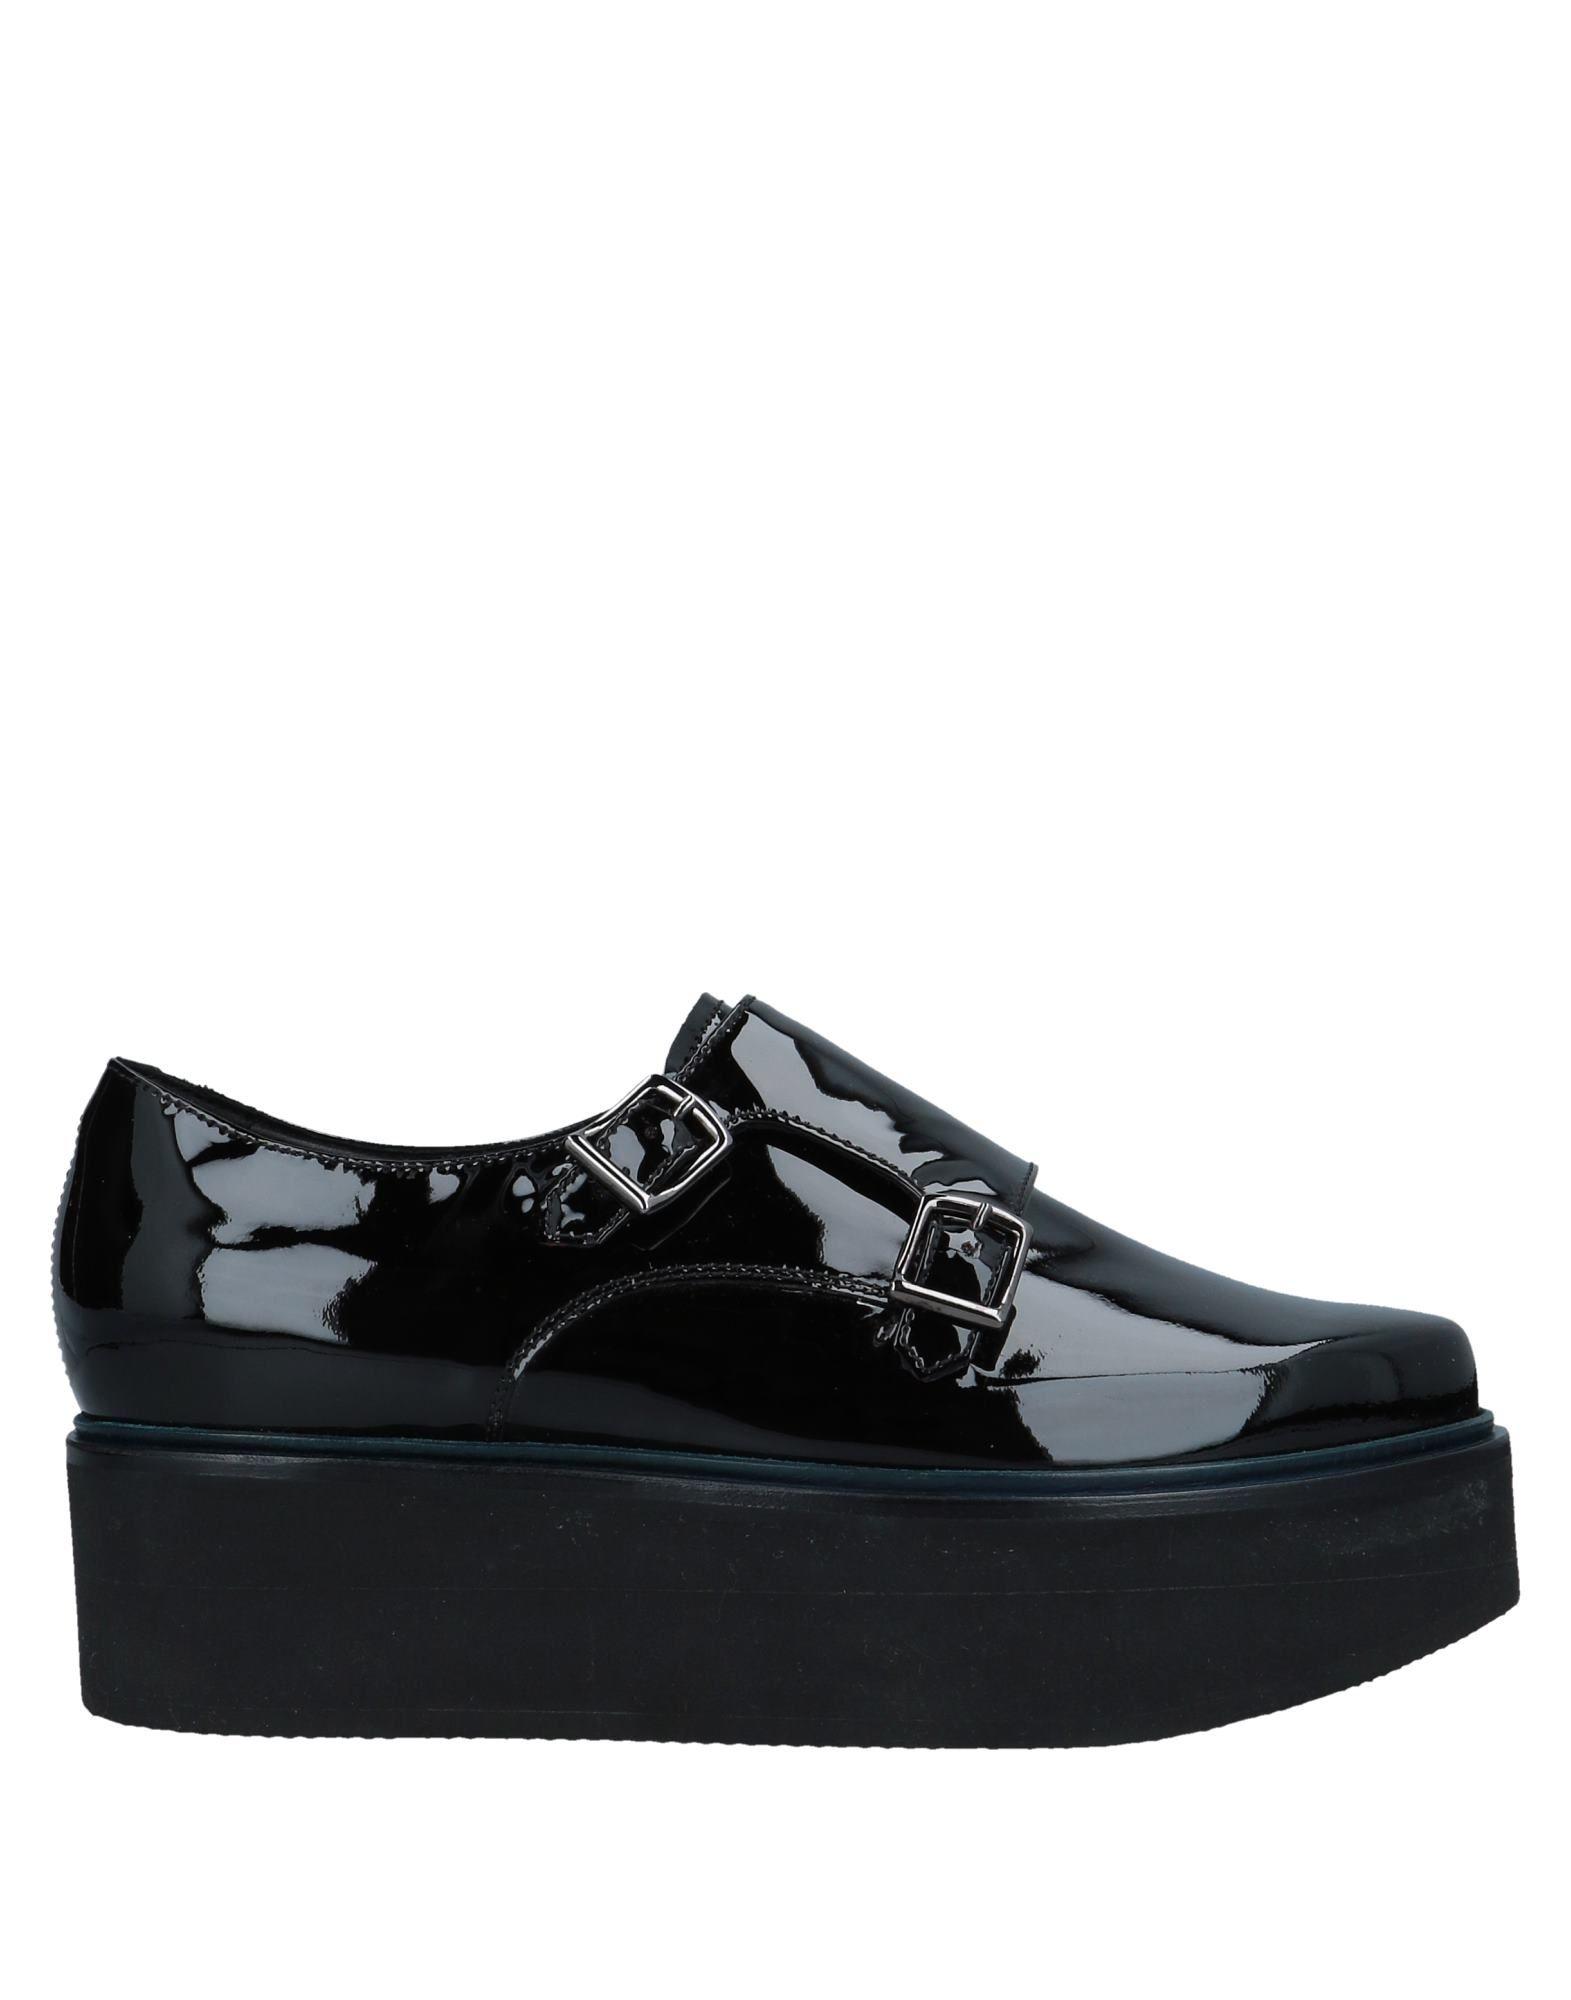 Fratelli Rossetti Mokassins Damen  11556827SAGut aussehende strapazierfähige Schuhe